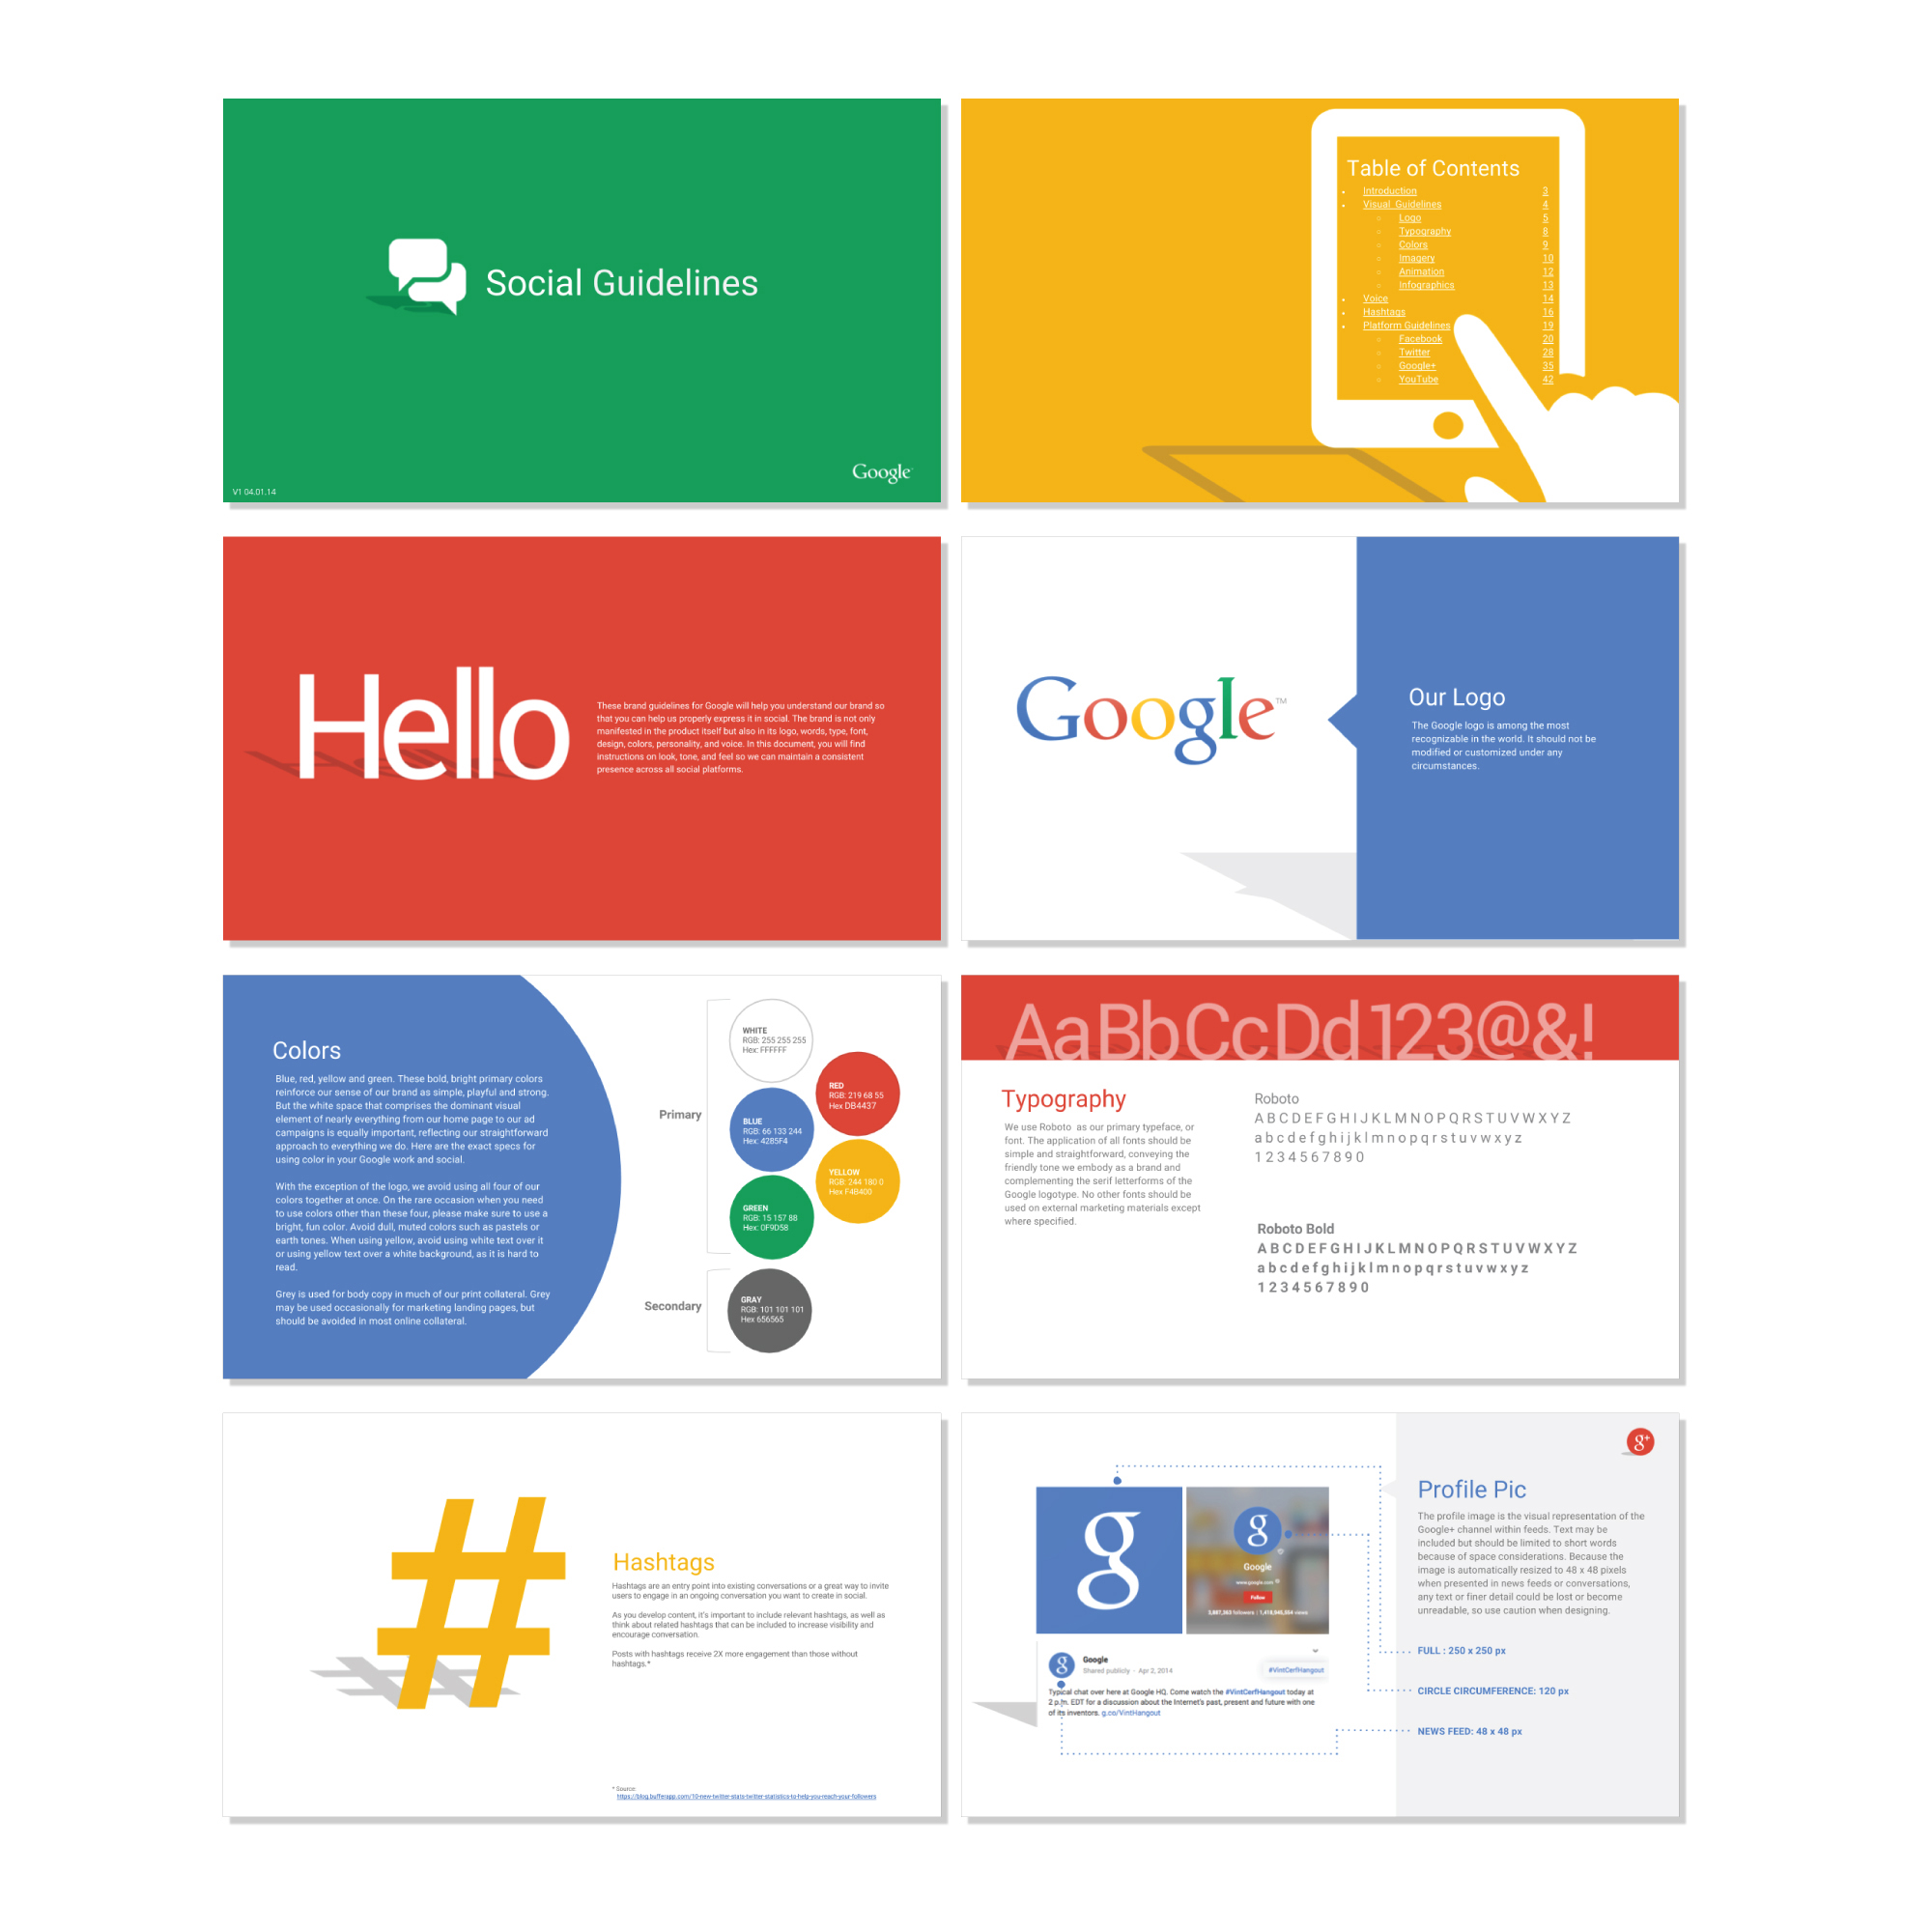 Google Social Styleguide